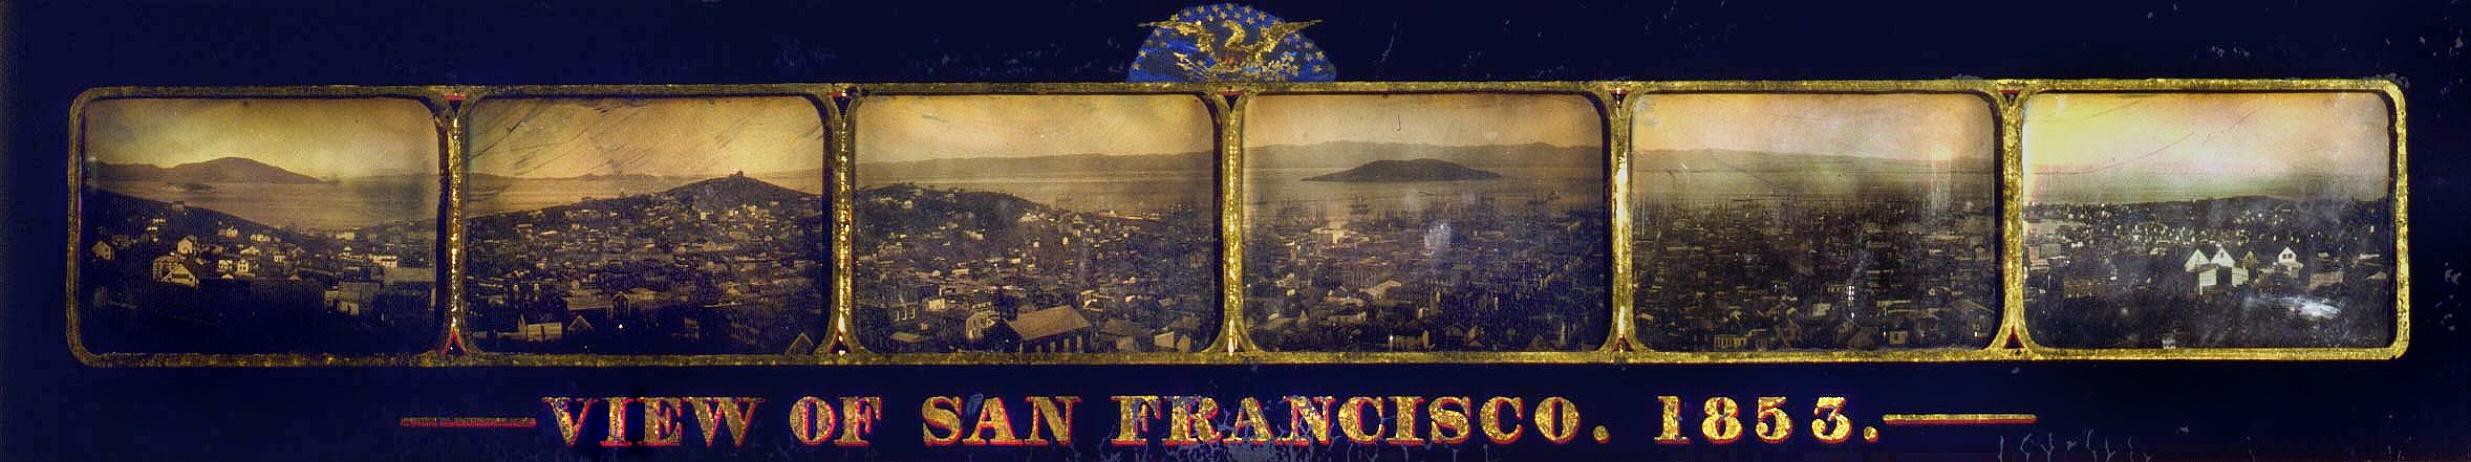 San_Francisco-1853.jpg